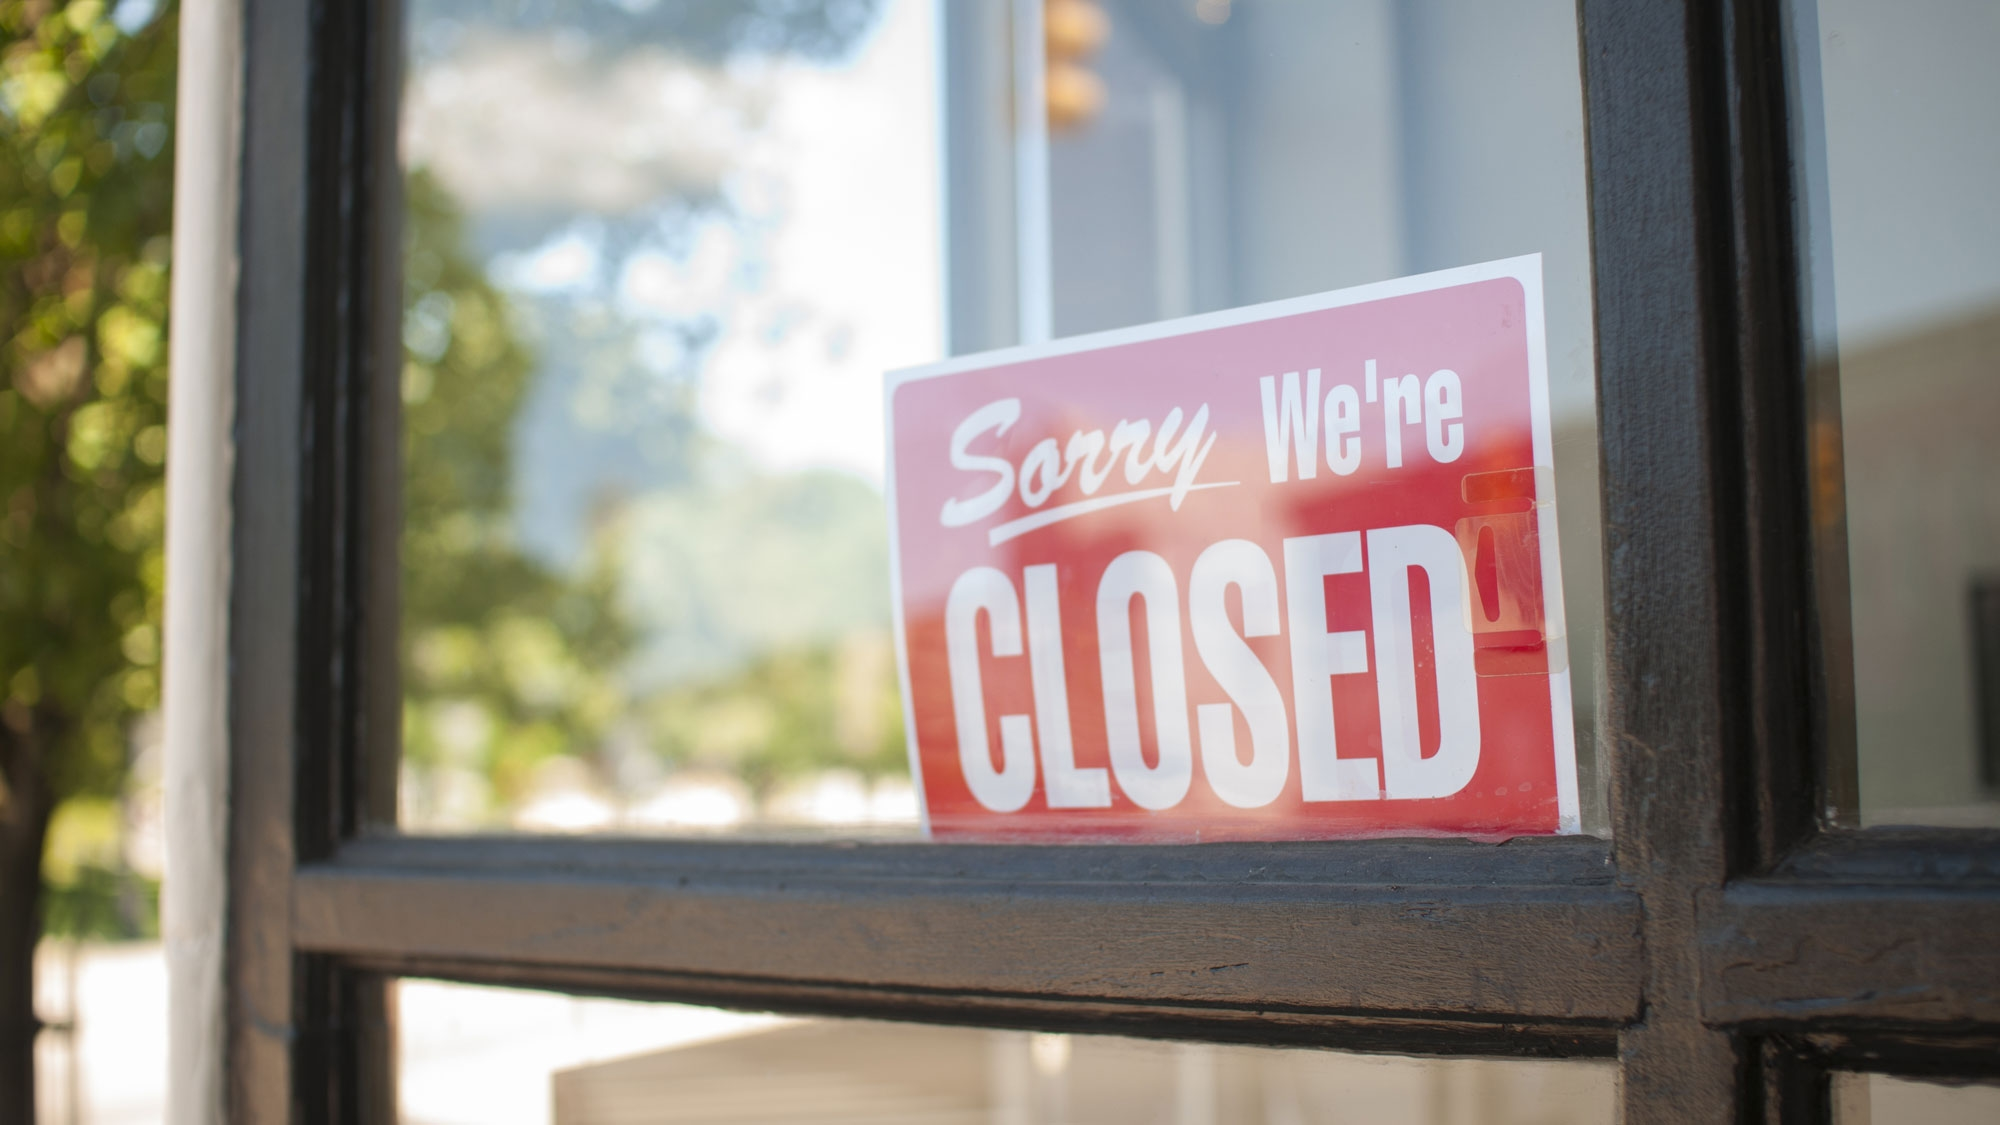 Google pesquisa loja encerrada